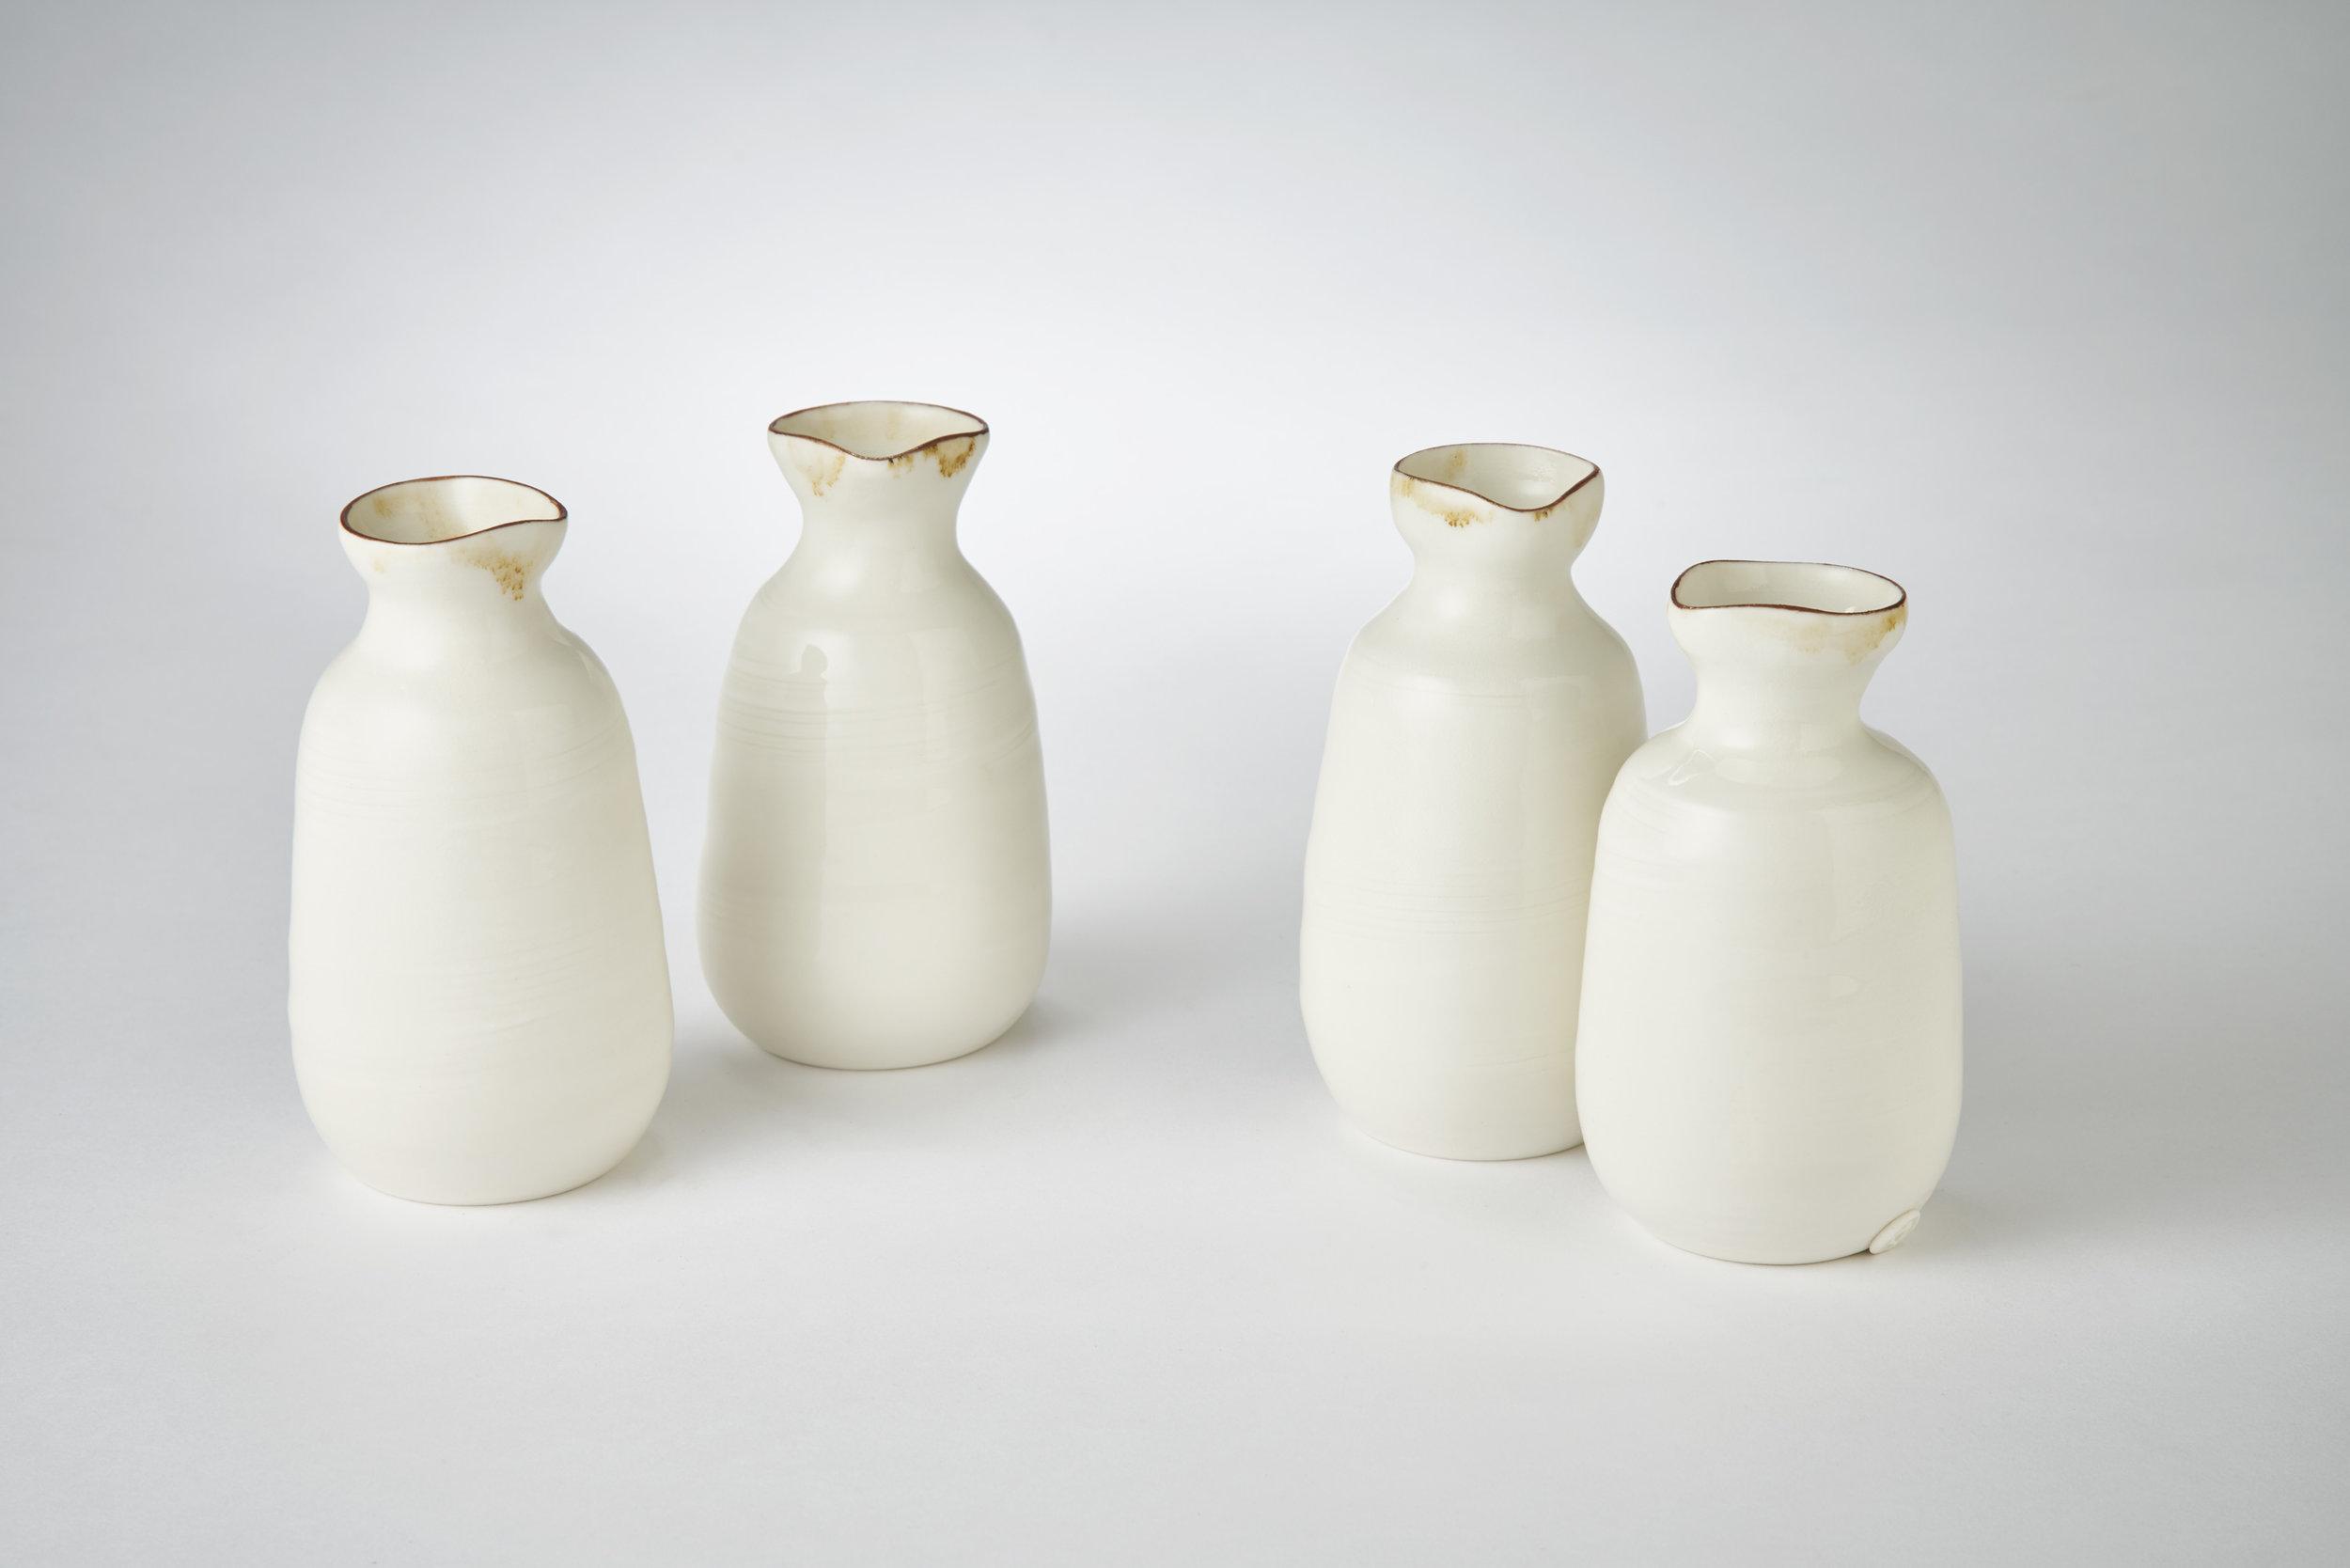 Adams K4 Ceramics porcelain oil pourers with bronze lustre rim, 4.5cm x 14.5cm, Photography Matthew Booth.jpg